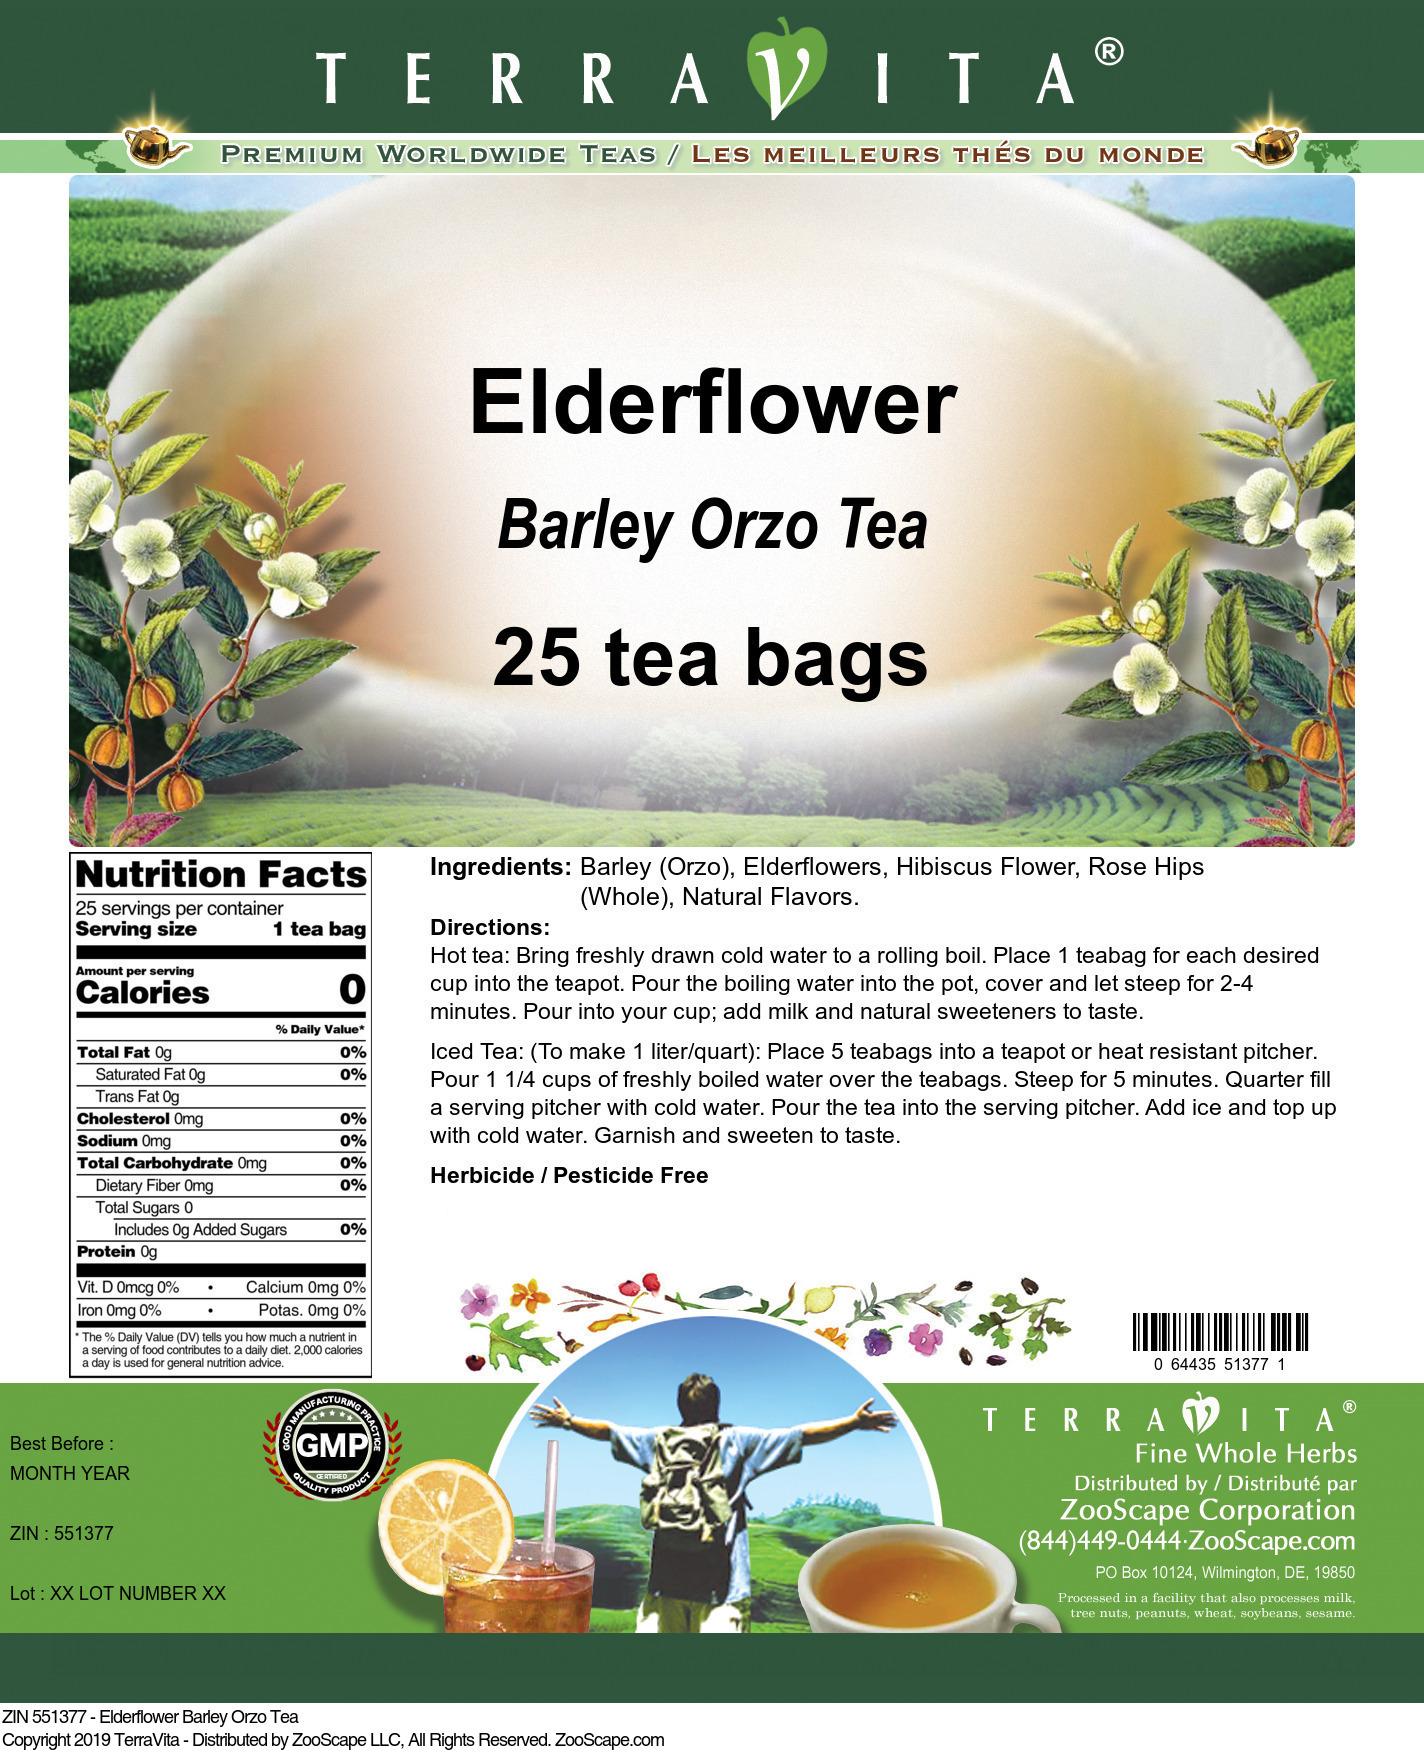 Elderflower Barley Orzo